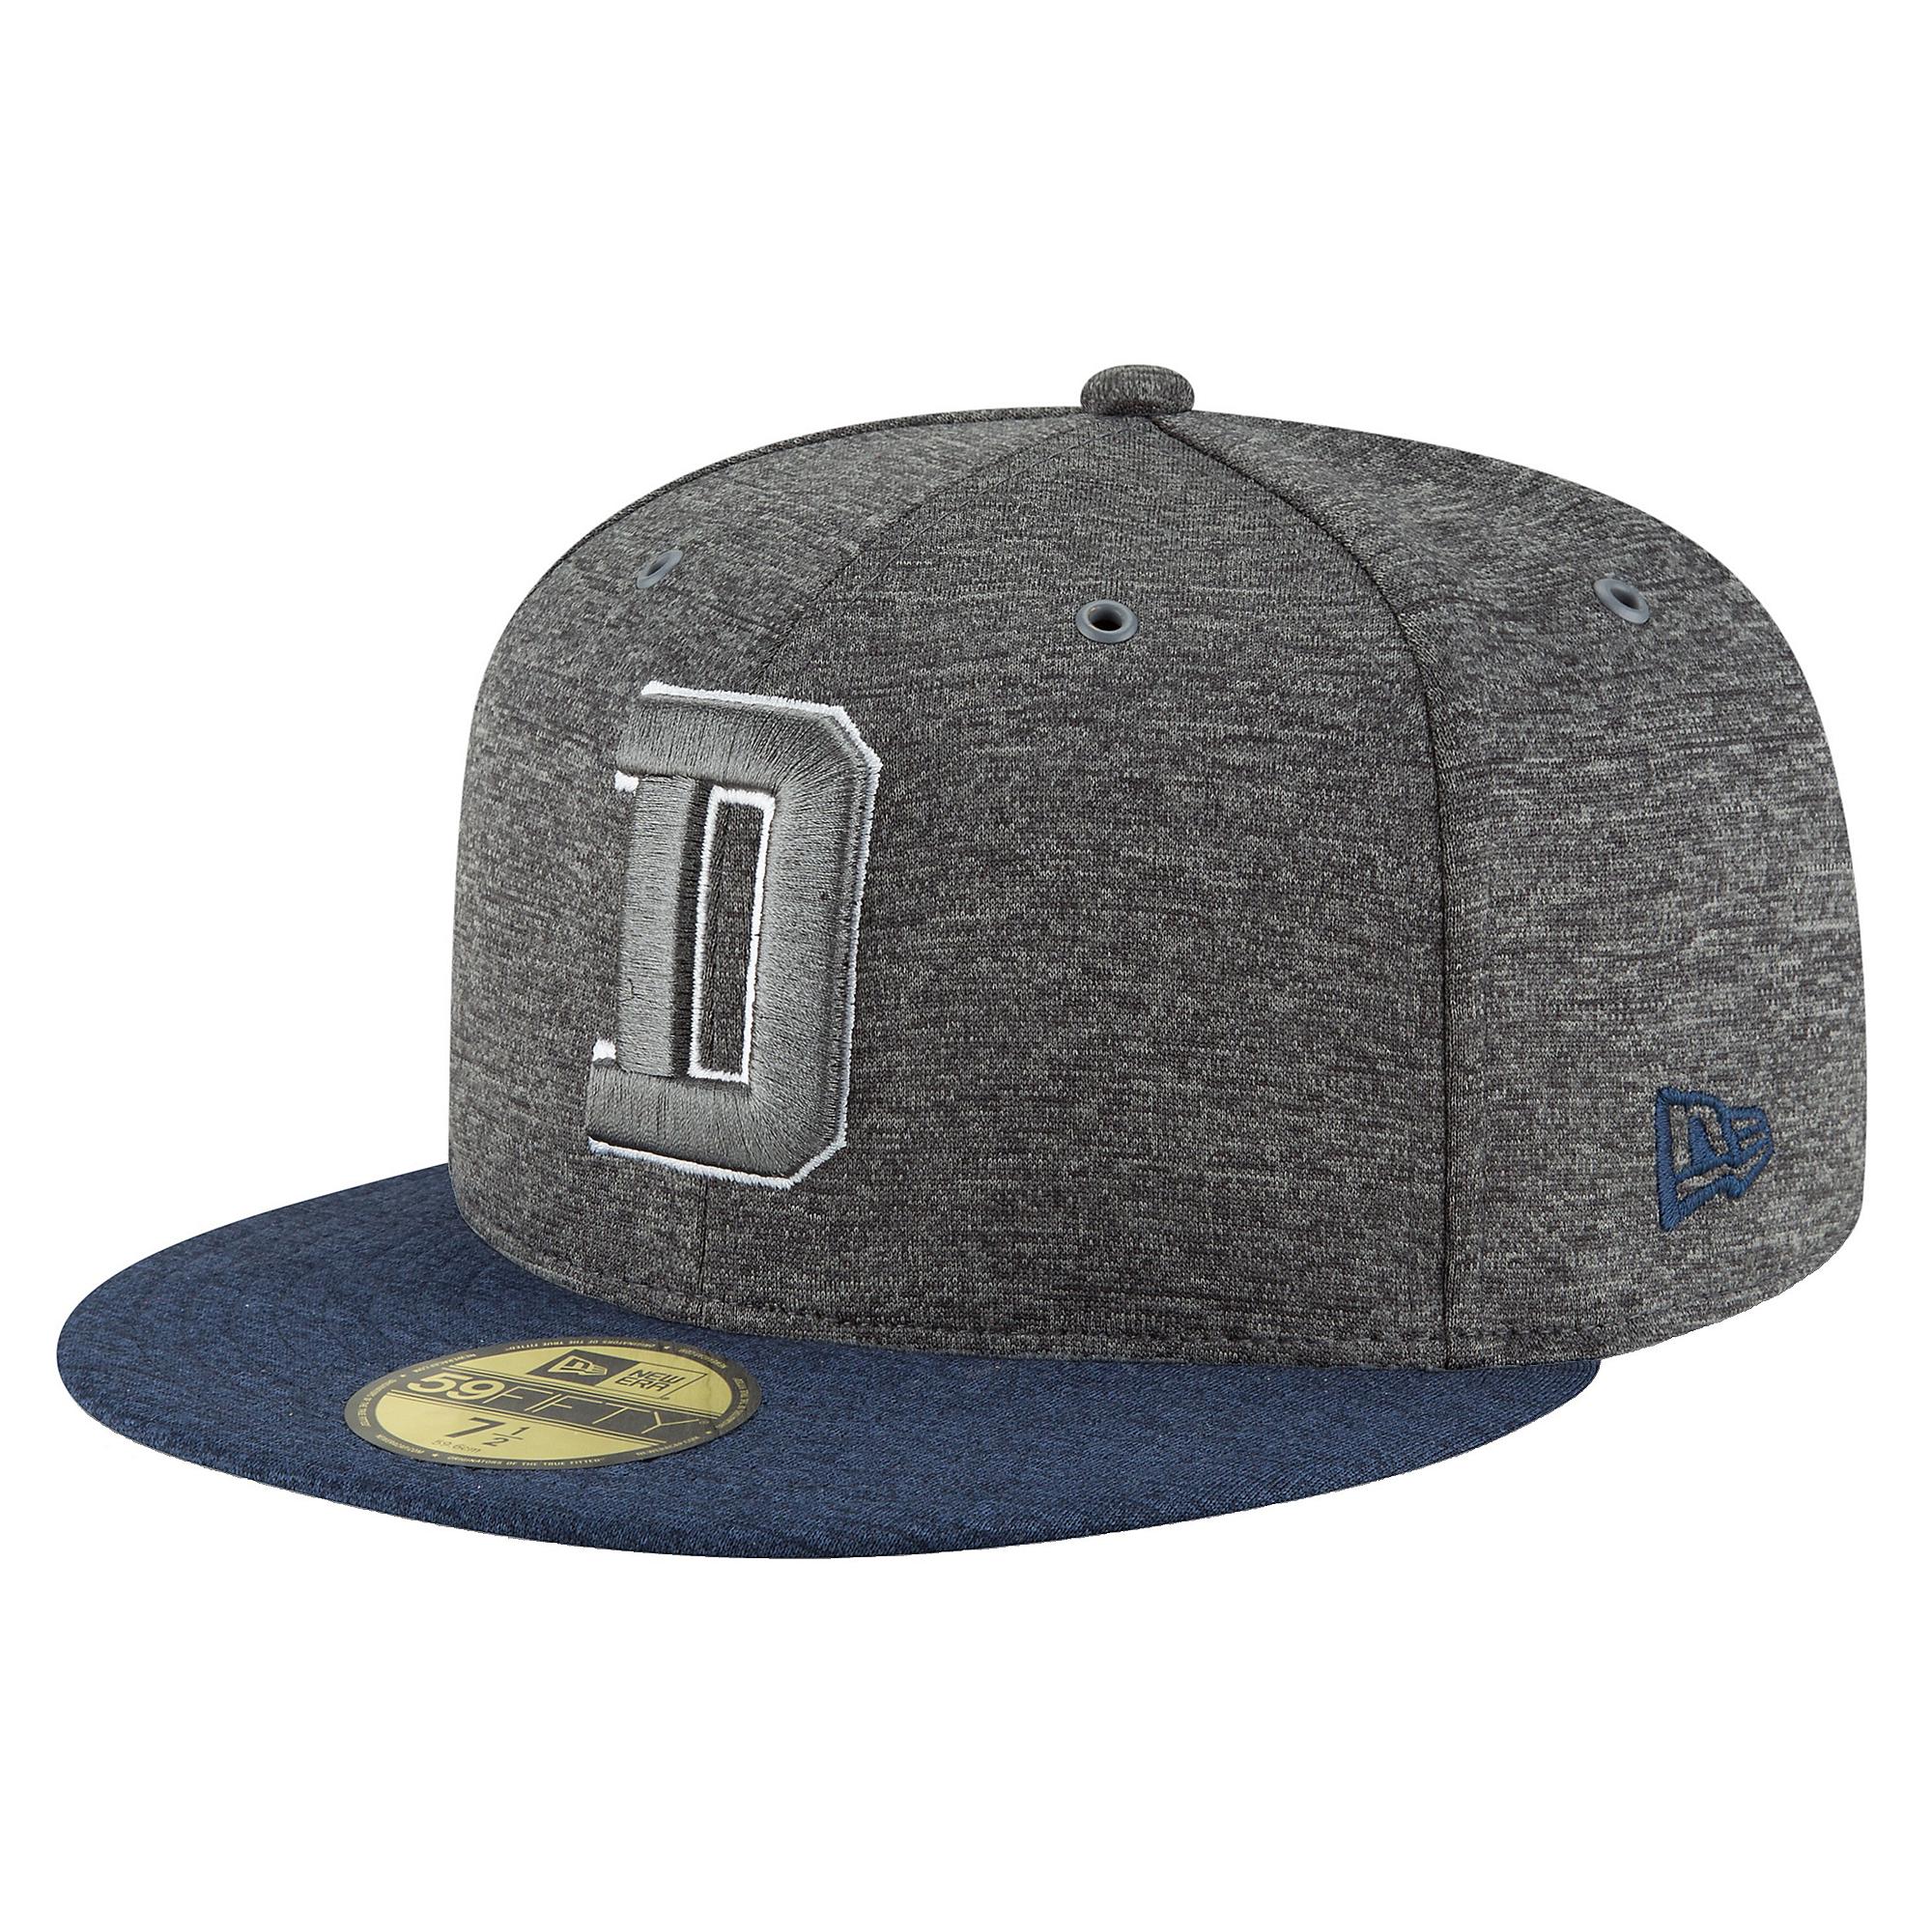 4d41efc488d Dallas Cowboys New Era Fashion Sideline Home 59Fifty Cap